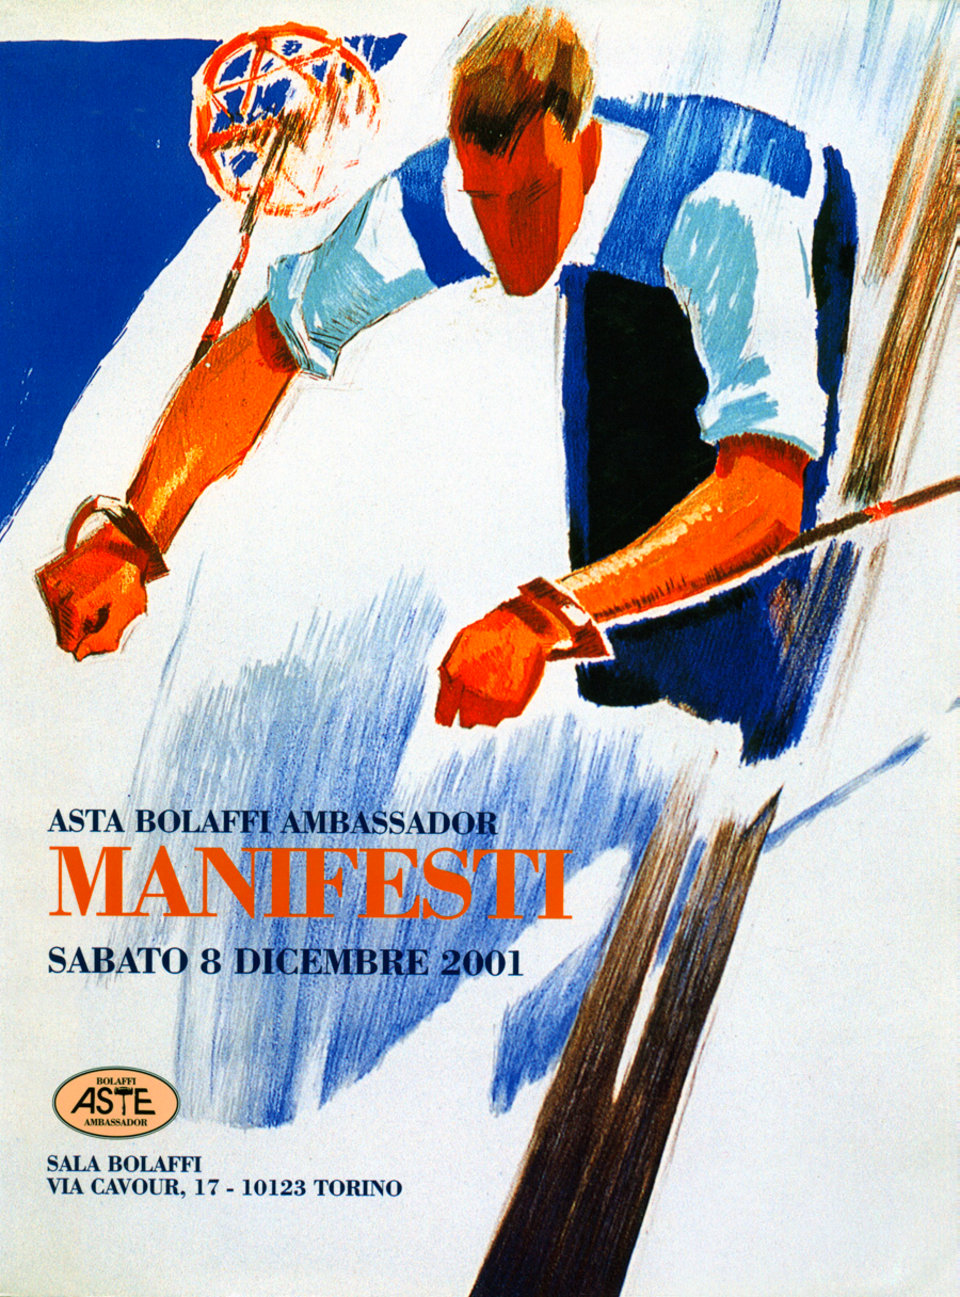 Asta Bolaffi Ambassador: Manifesti 2001 Italian Catalog